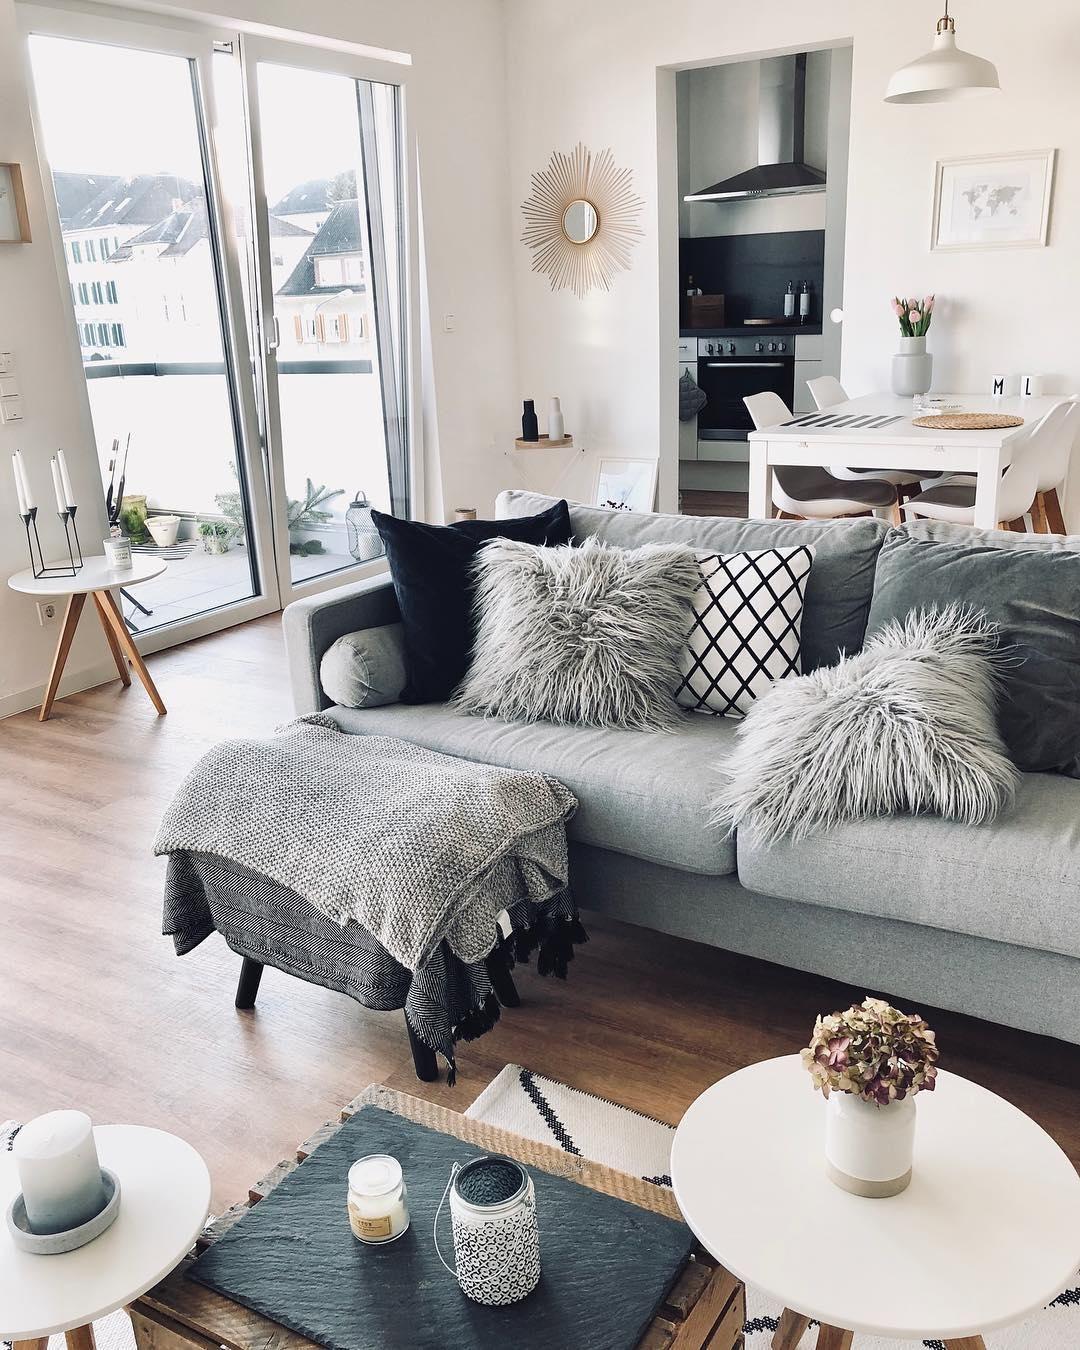 Lammfell-Kissenhülle Ella | Pinterest | Lammfell, Wohnzimmer sofas ...